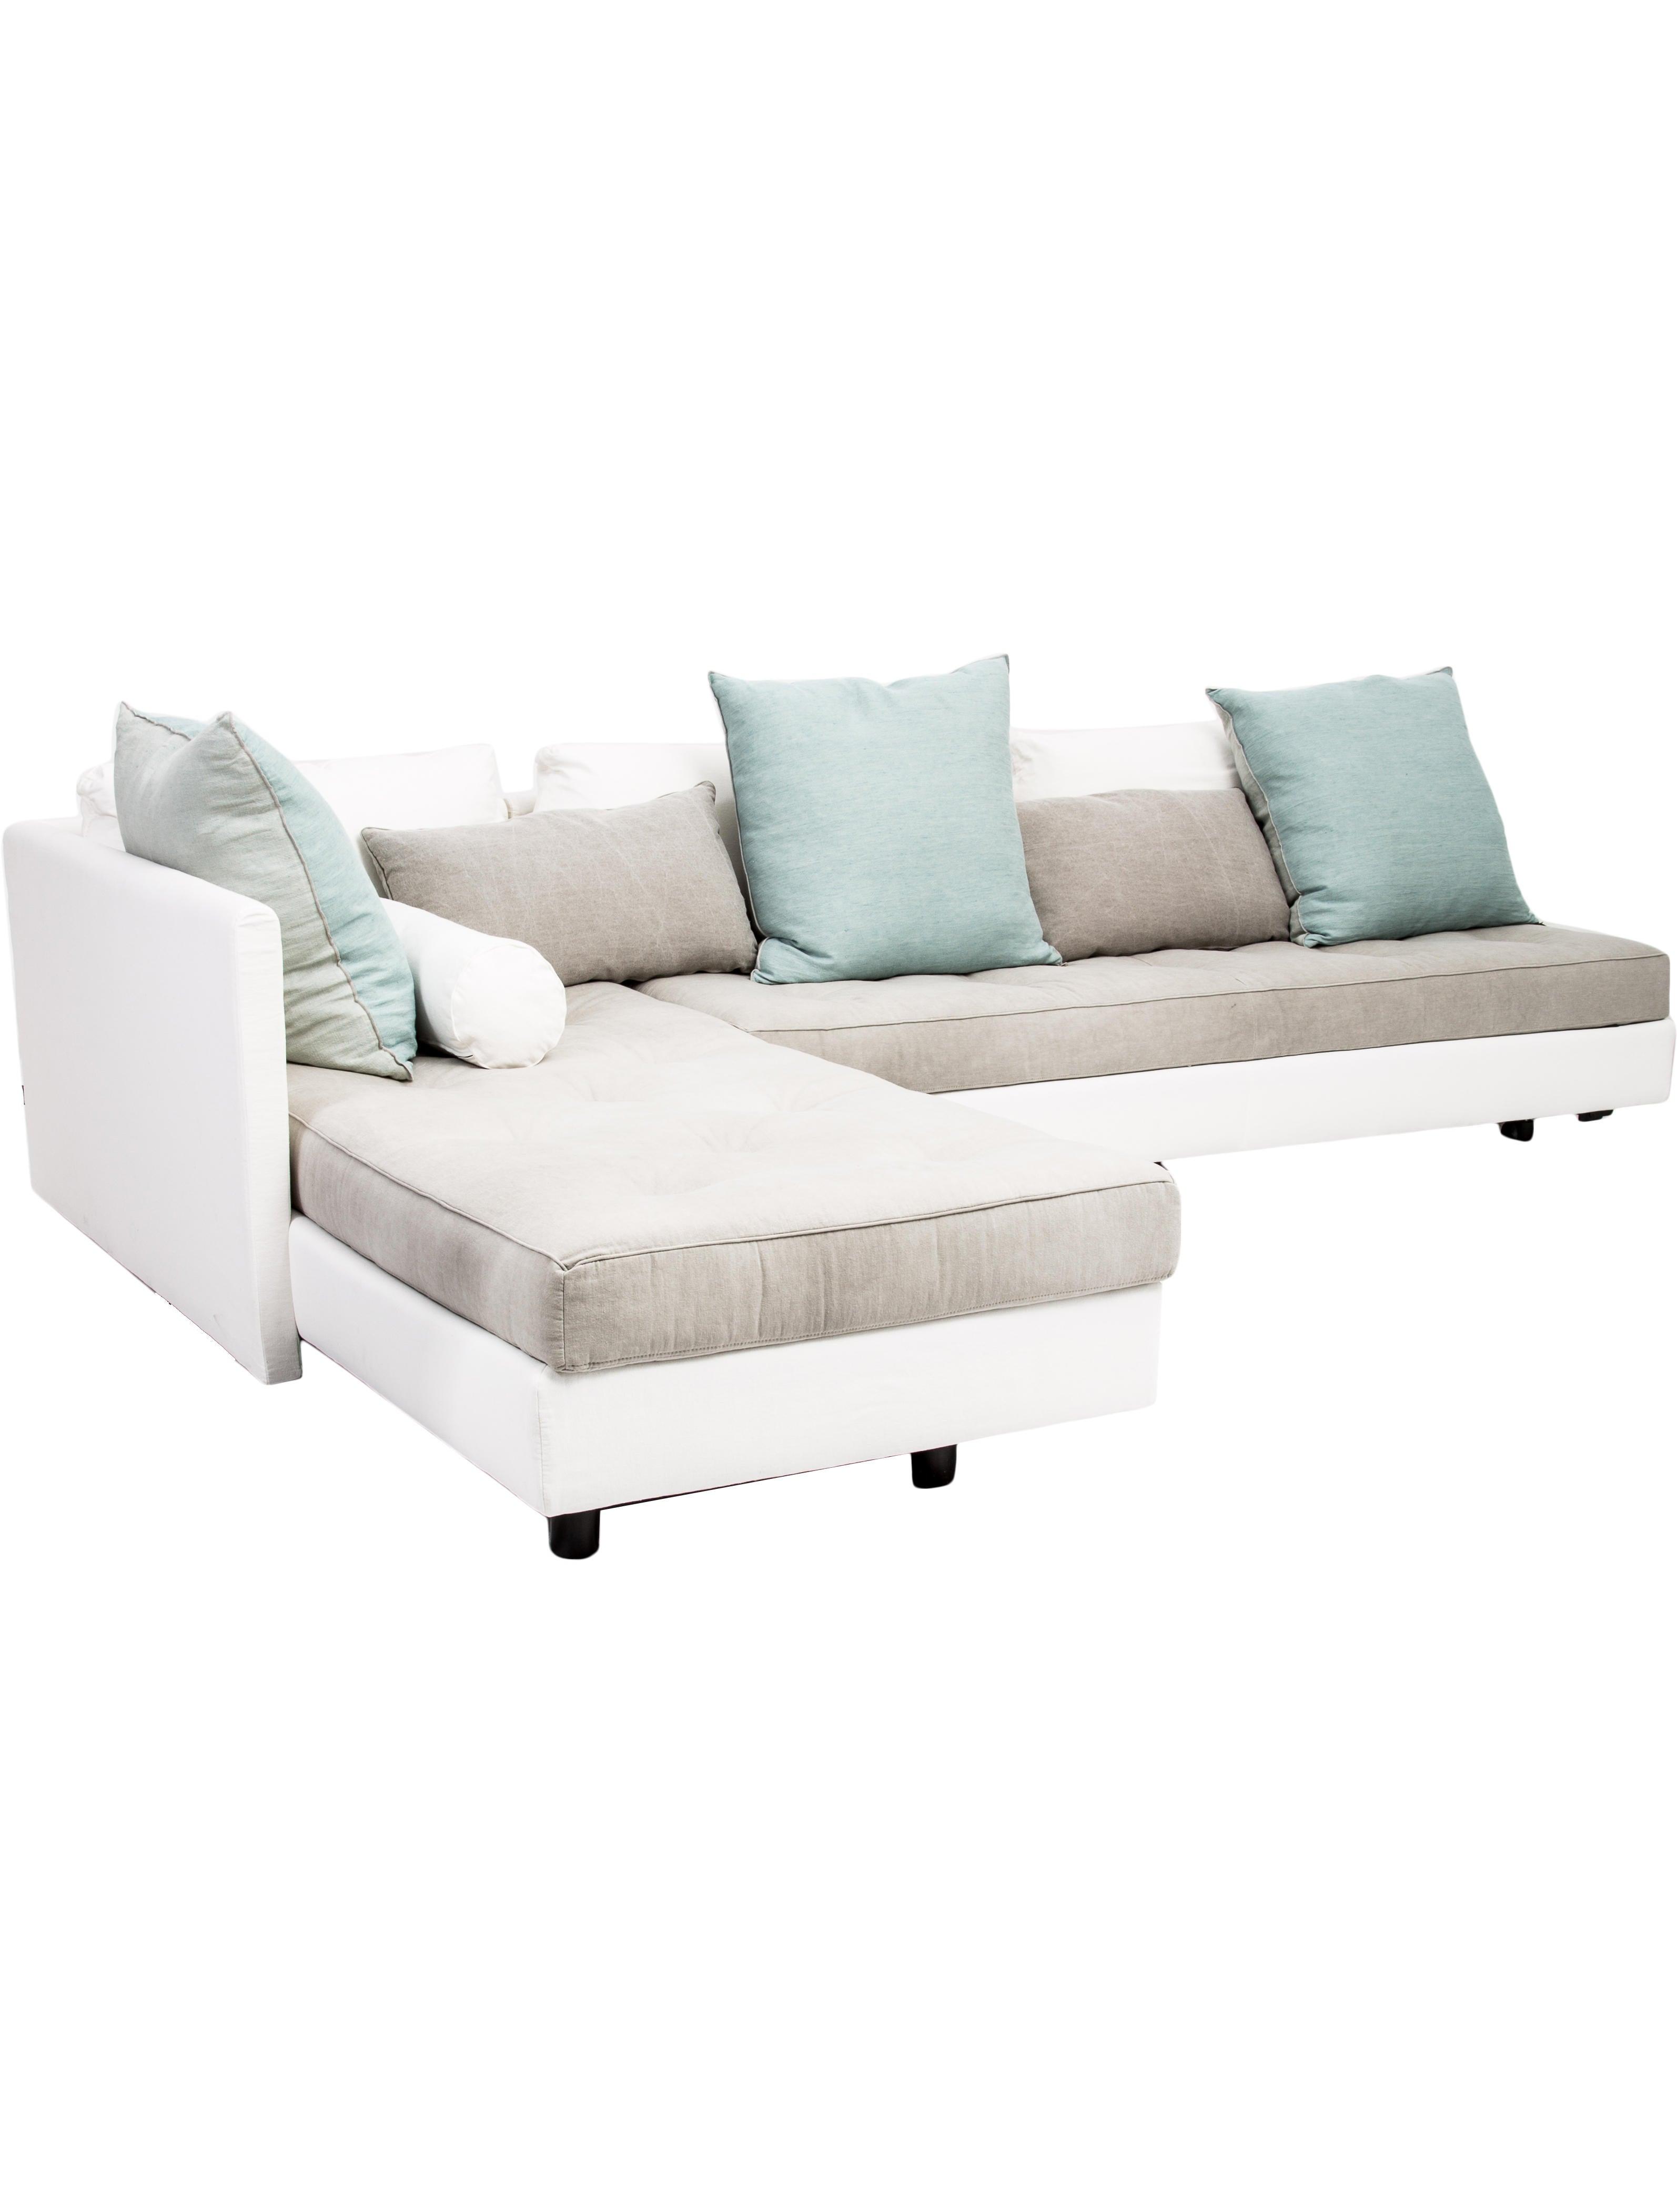 Ligne Roset Didier Gomez Nomade 2 Convertible Sofa Furniture  # Federici Muebles Canada Gomez